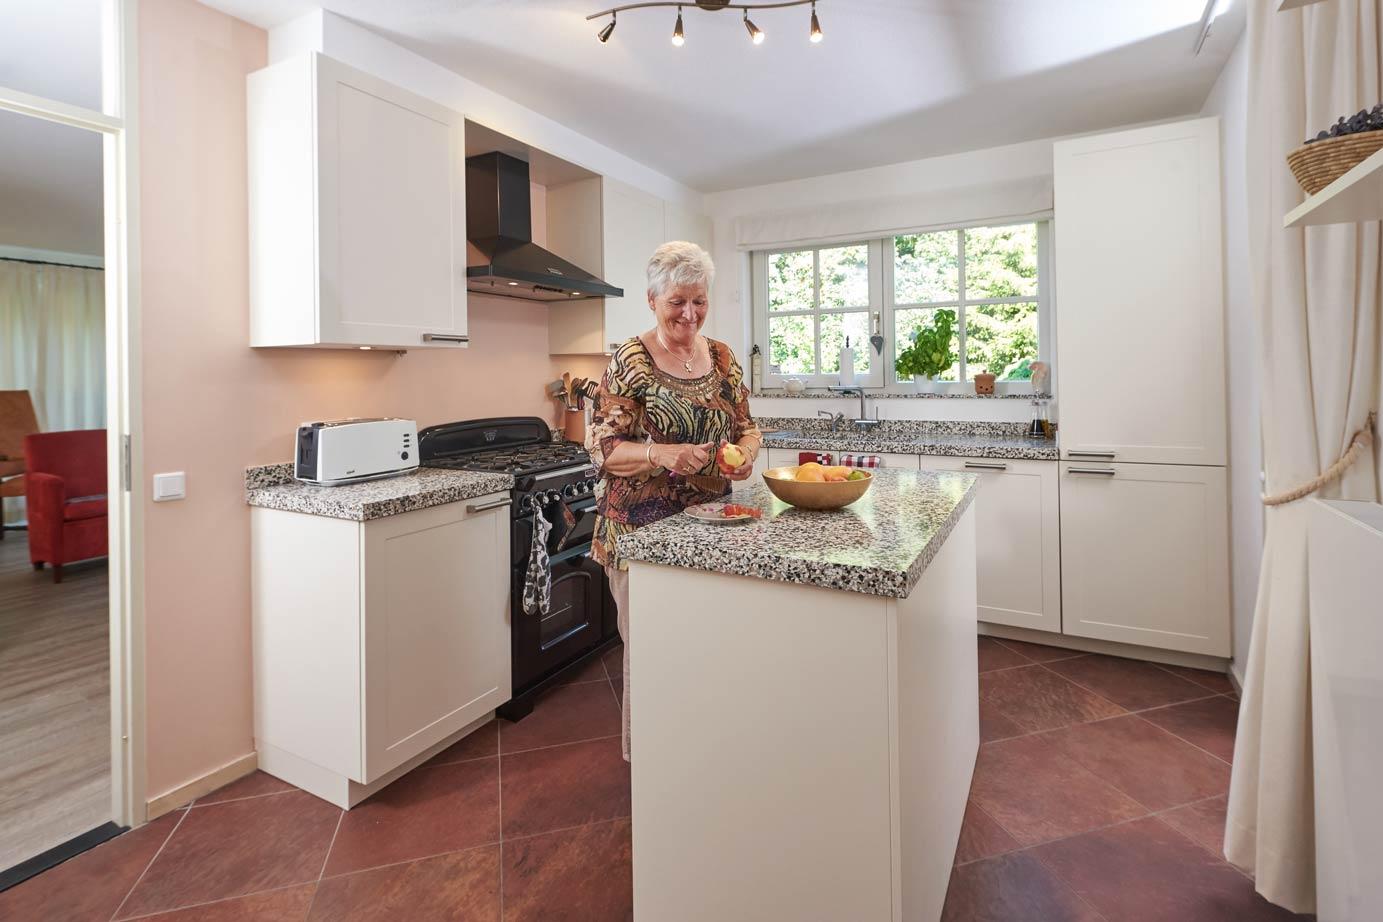 Steigerhout Keuken Kopen : Keuken steigerhout zelf maken better steigerhouten buitenkeuken